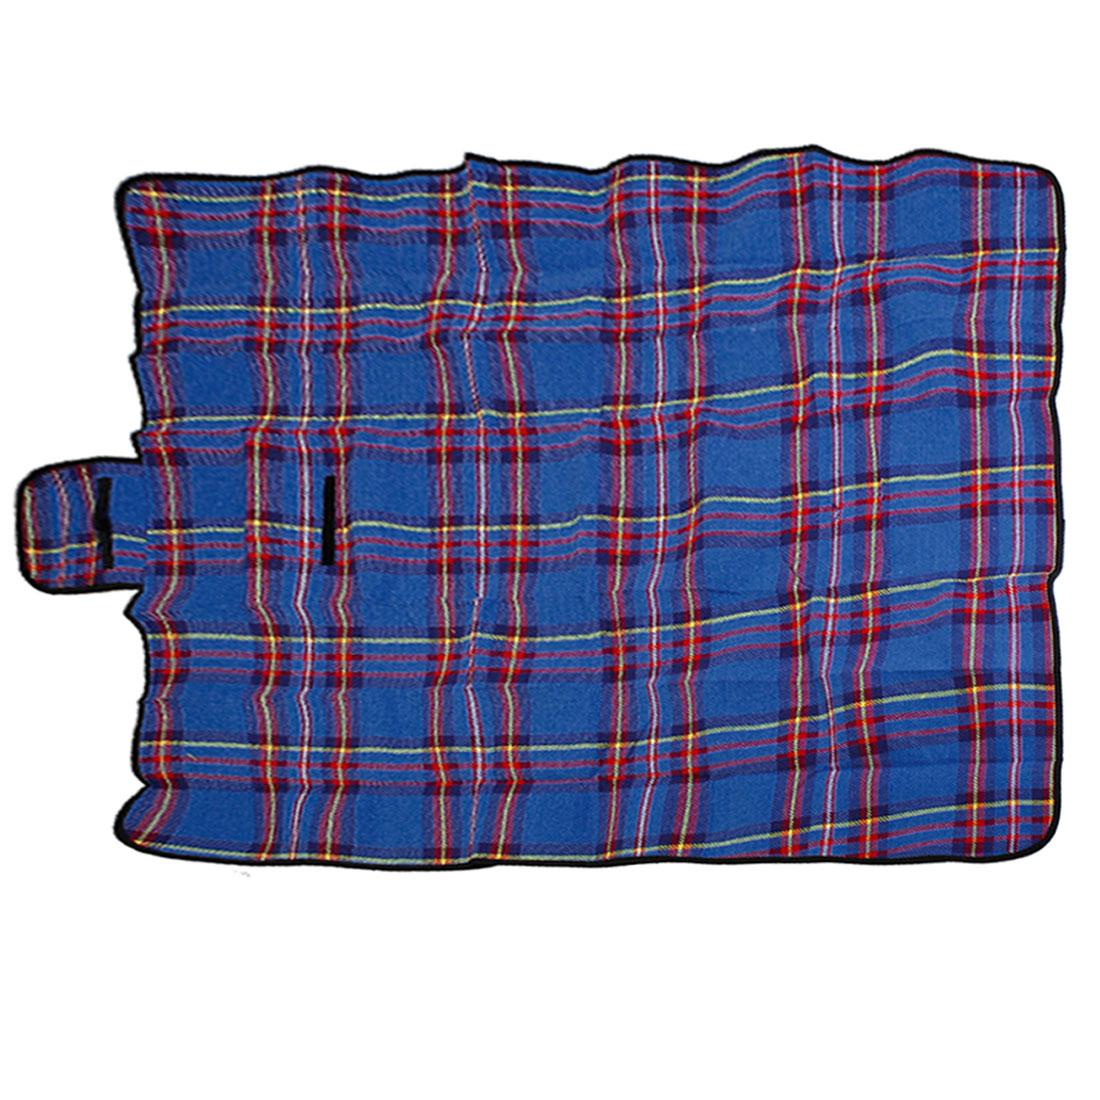 130cm x 150cm Basket Beach Garden Camping Picnic Mat Pad Blanket Blue